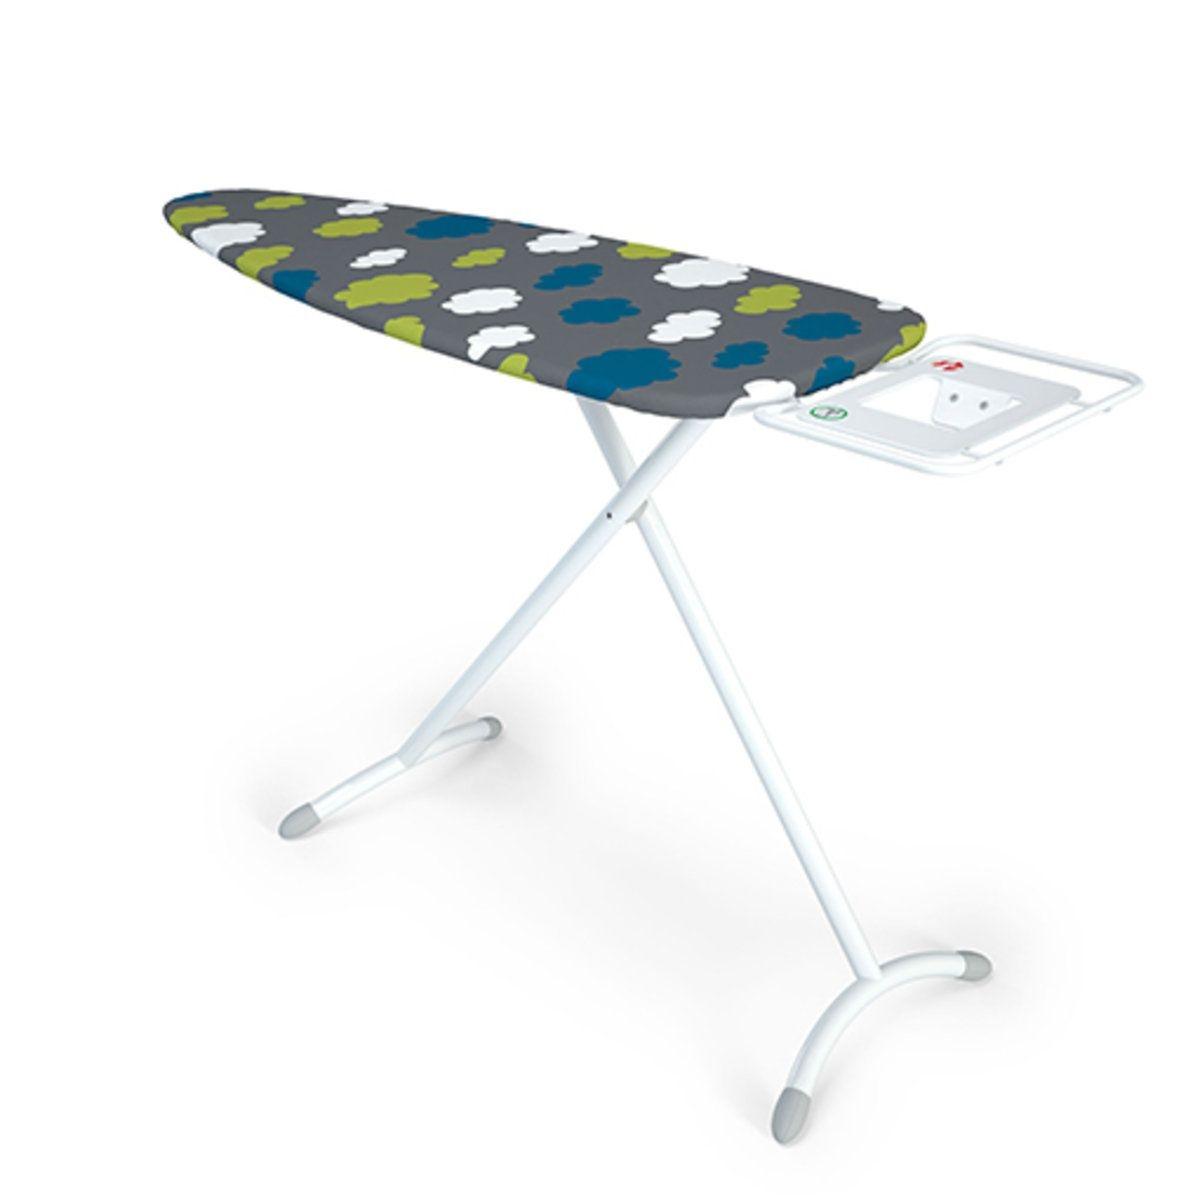 Vente table repasser tritoo maison et jardin - Table a repasser cdiscount ...